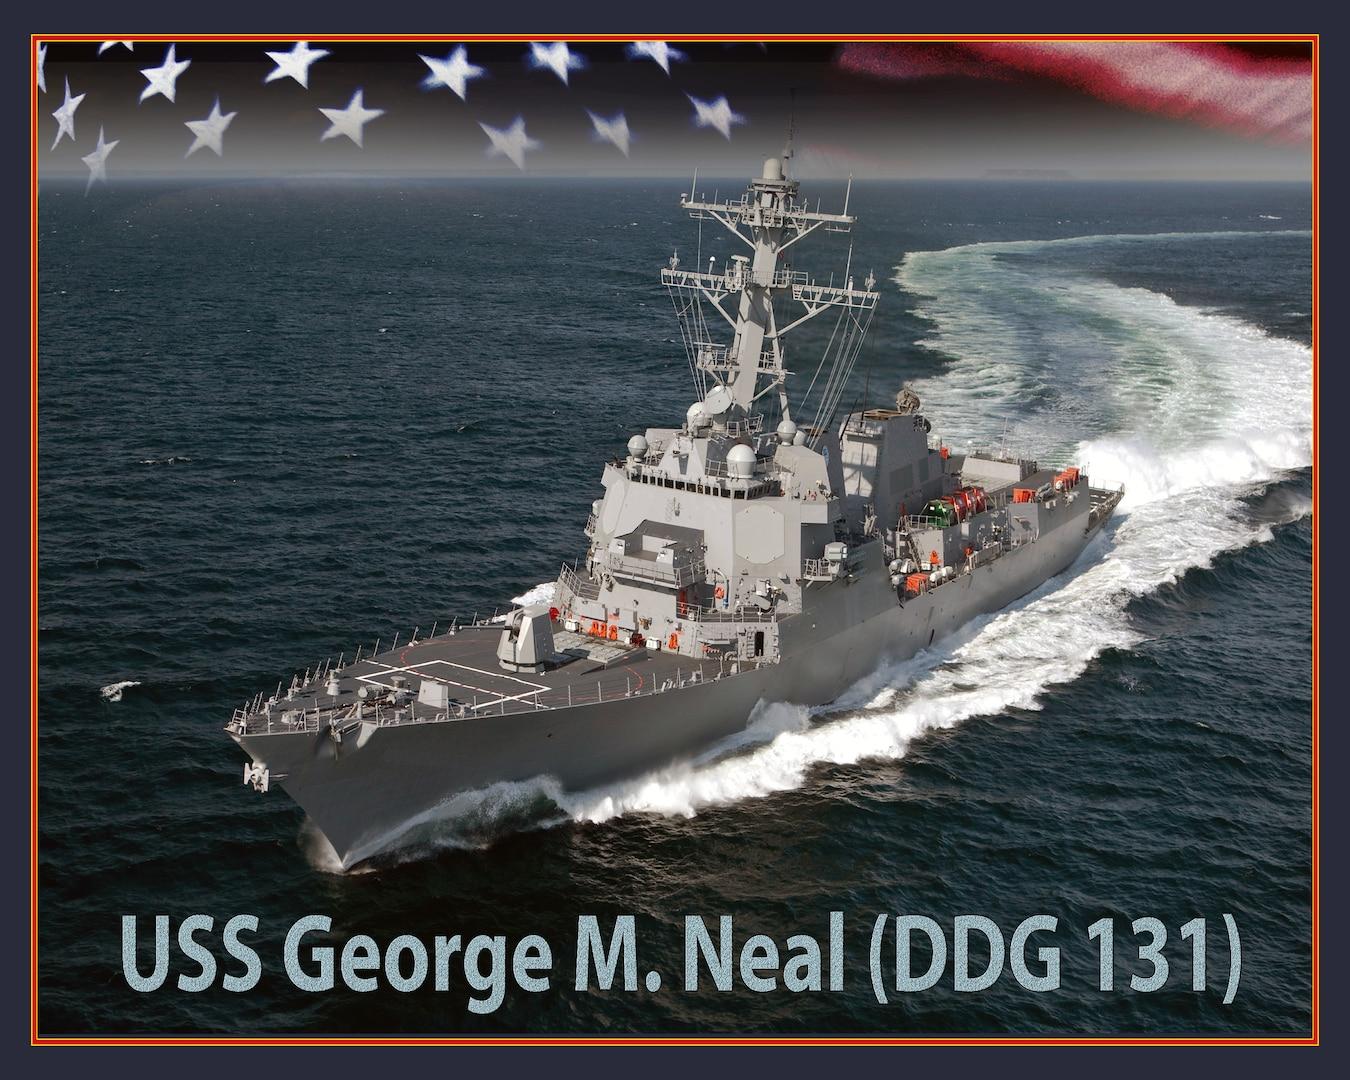 Secretary of the Navy Names Destroyer in Honor of US Navy, Korean War Veteran